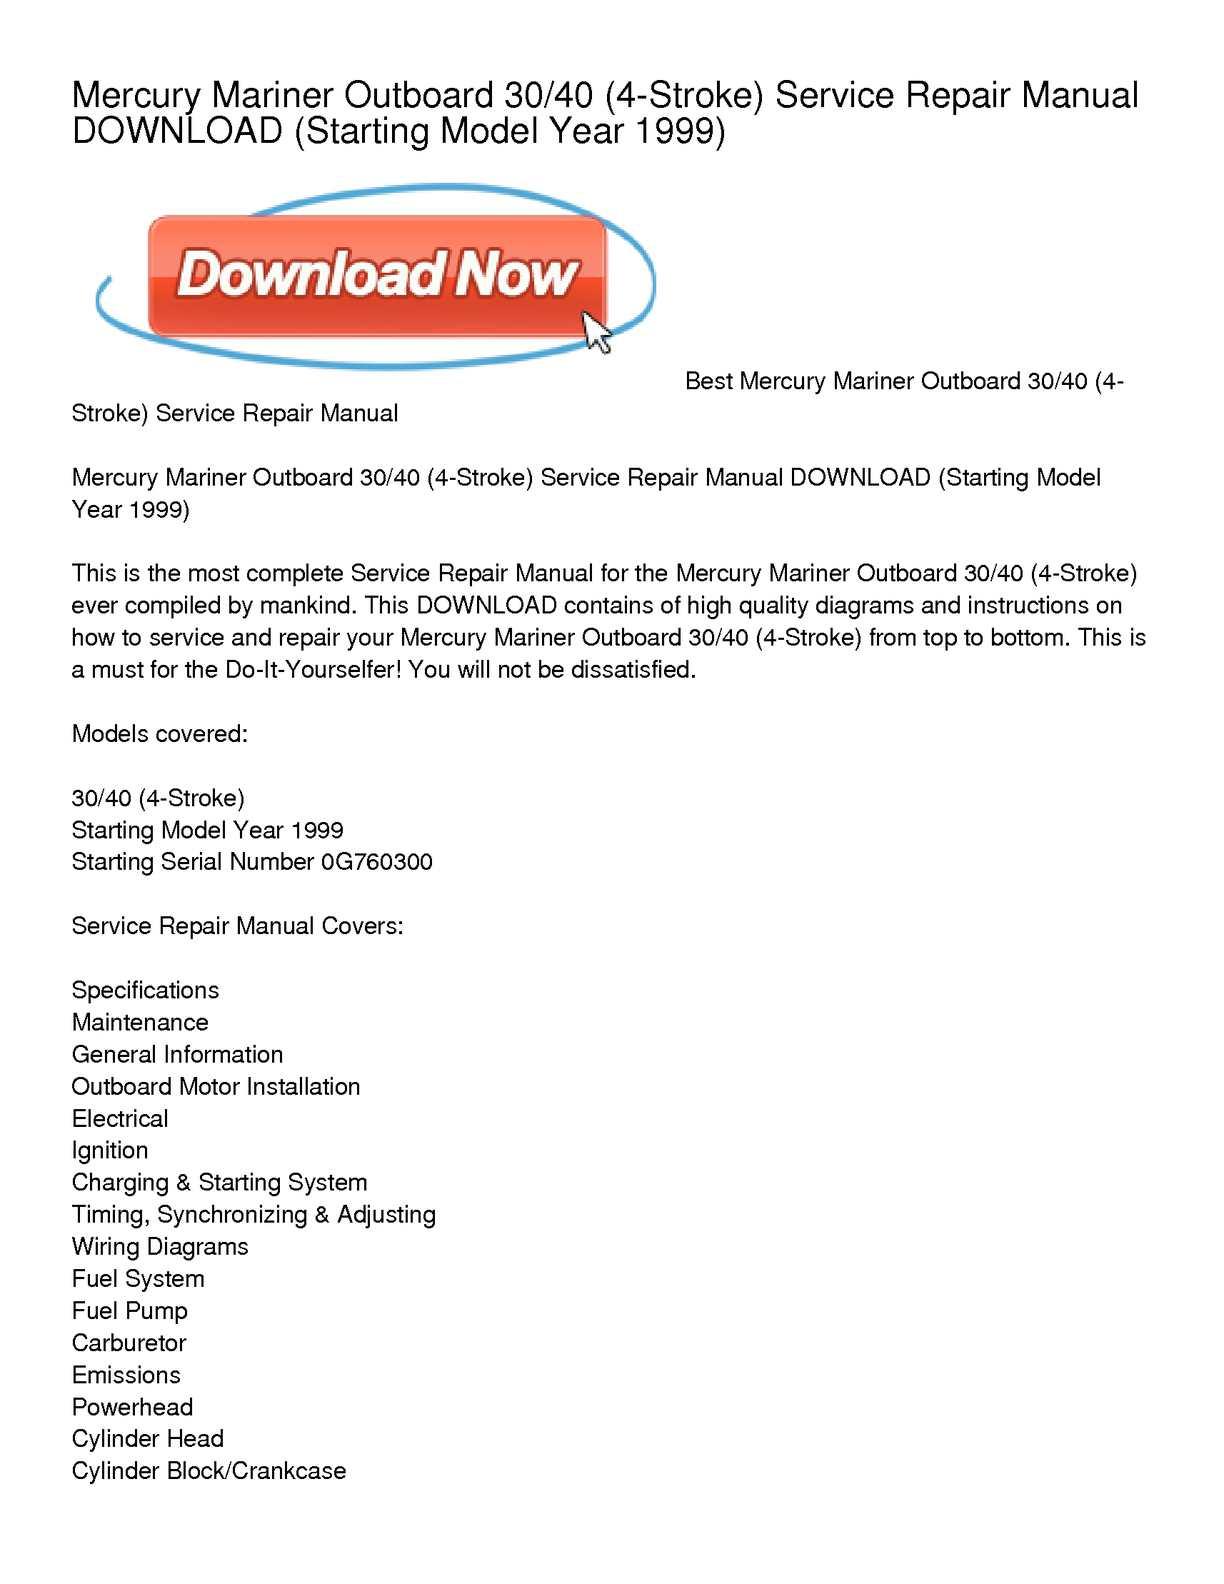 Calaméo - Mercury Mariner Outboard 30_40 (4-Stroke) Service Repair Manual  DOWNLOAD